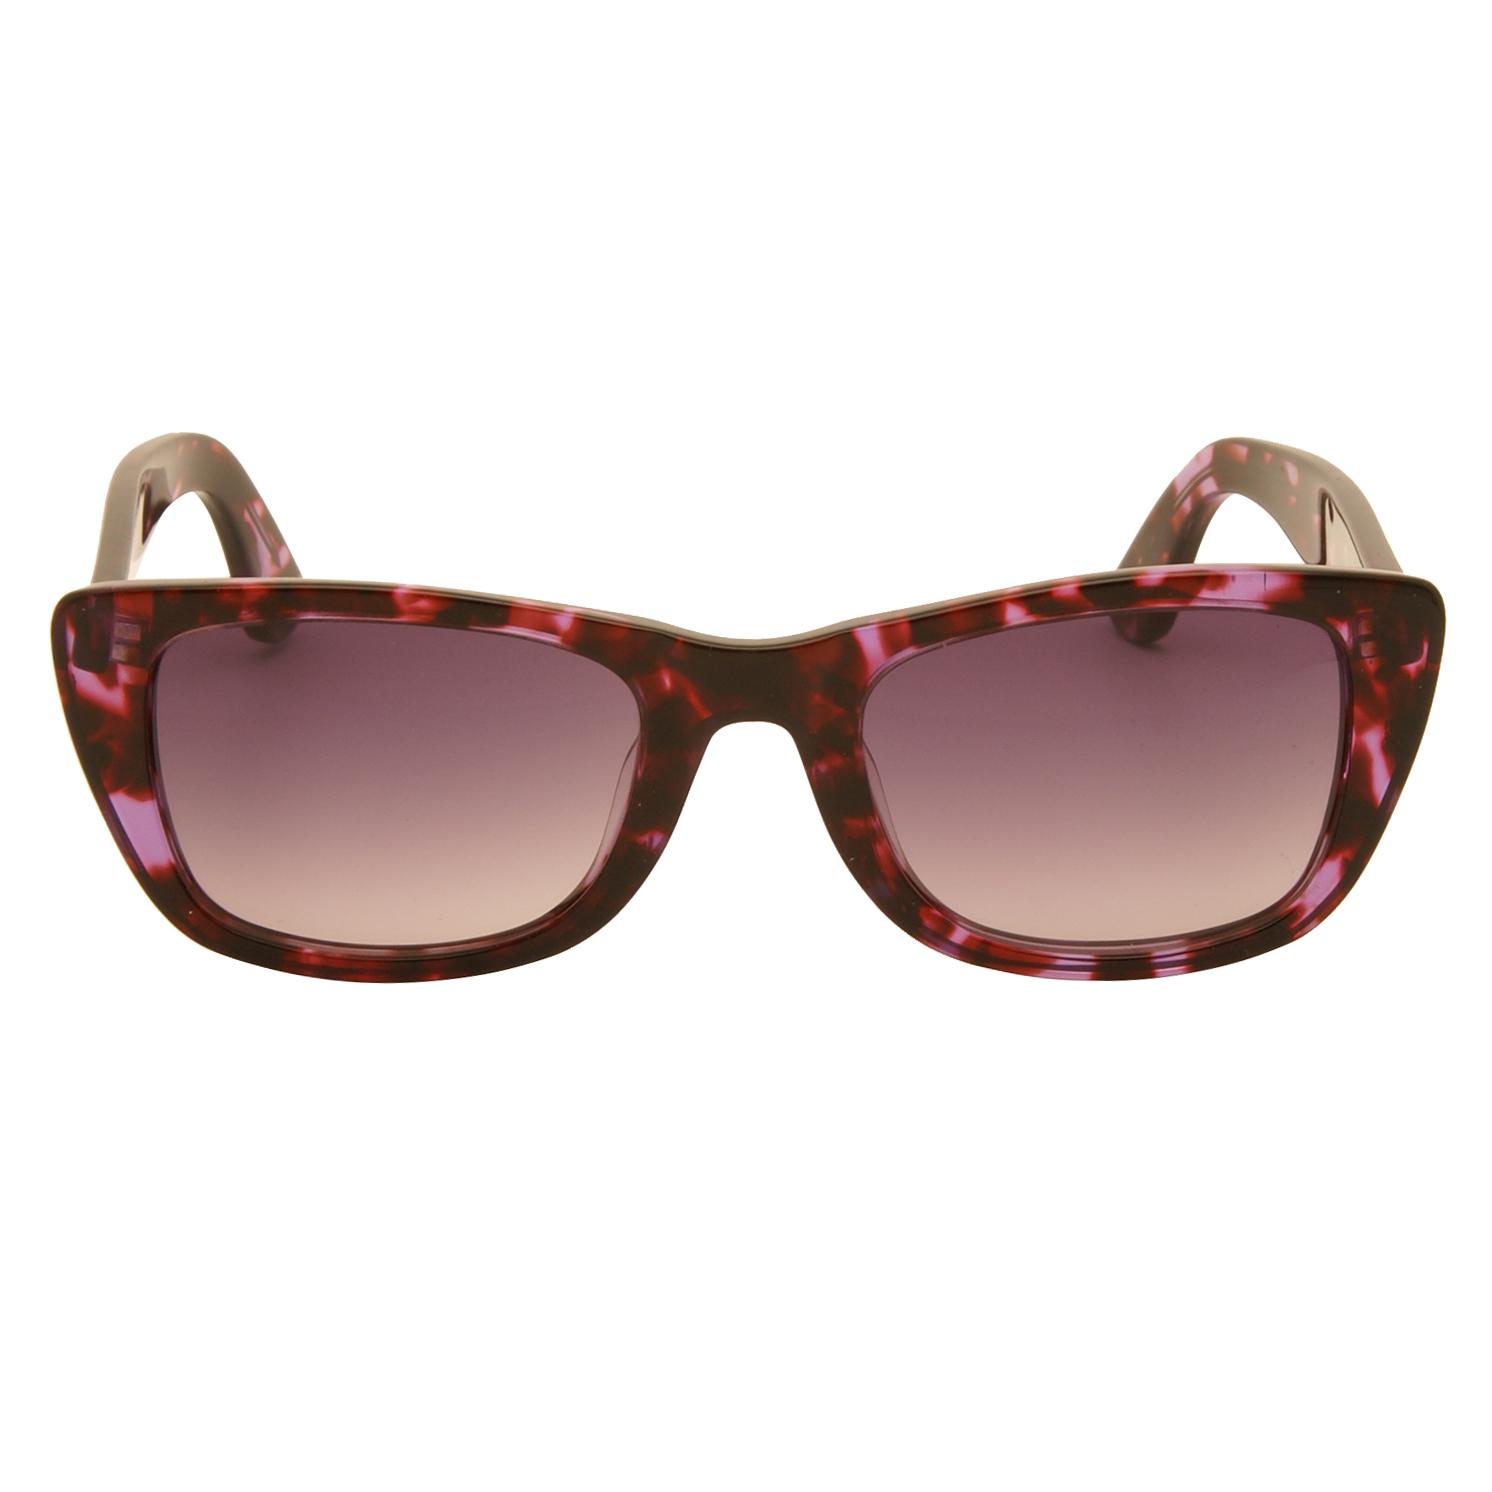 Just Cavalli – Purple Animal Print Cat Eye Style Sunglasses with Case